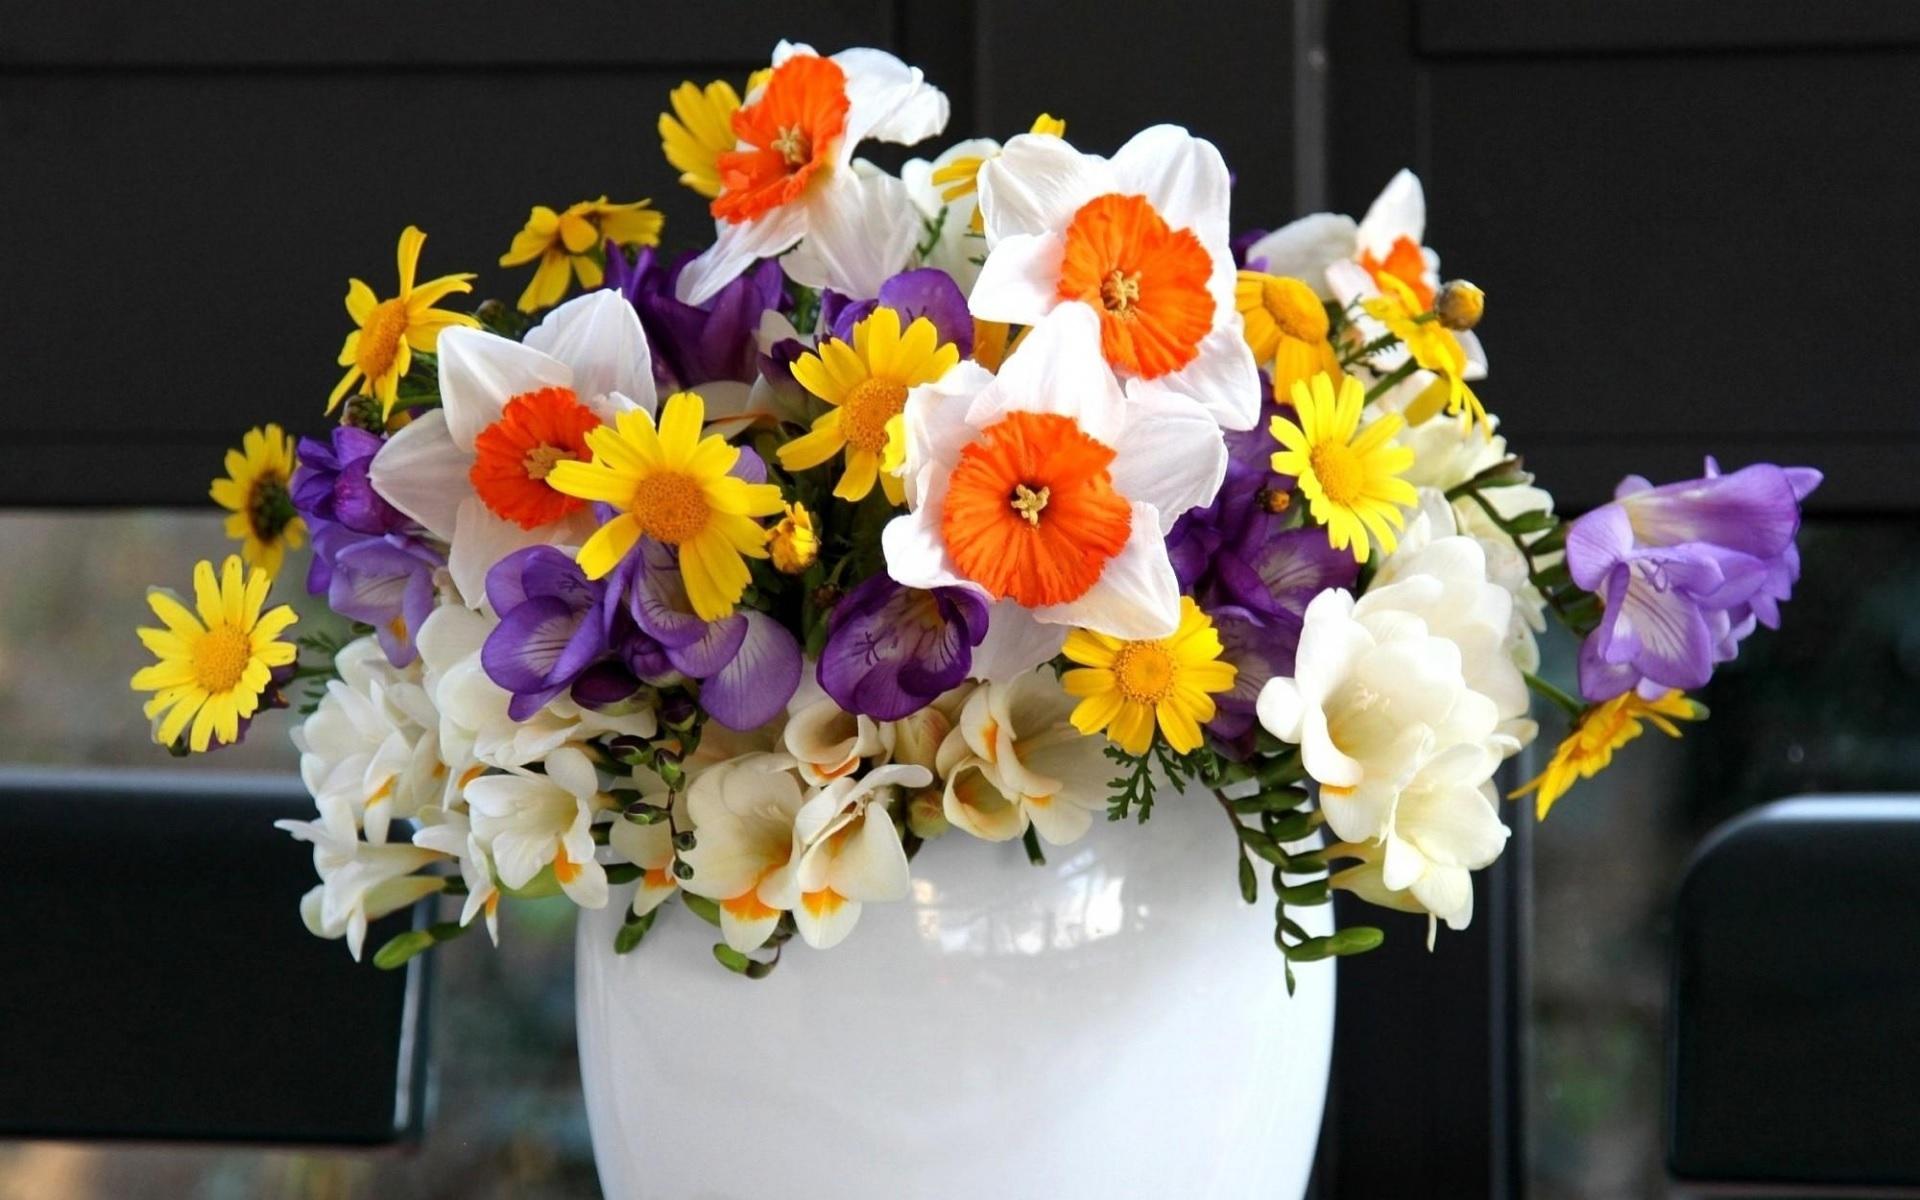 Комбинации фрезии с другими цветами